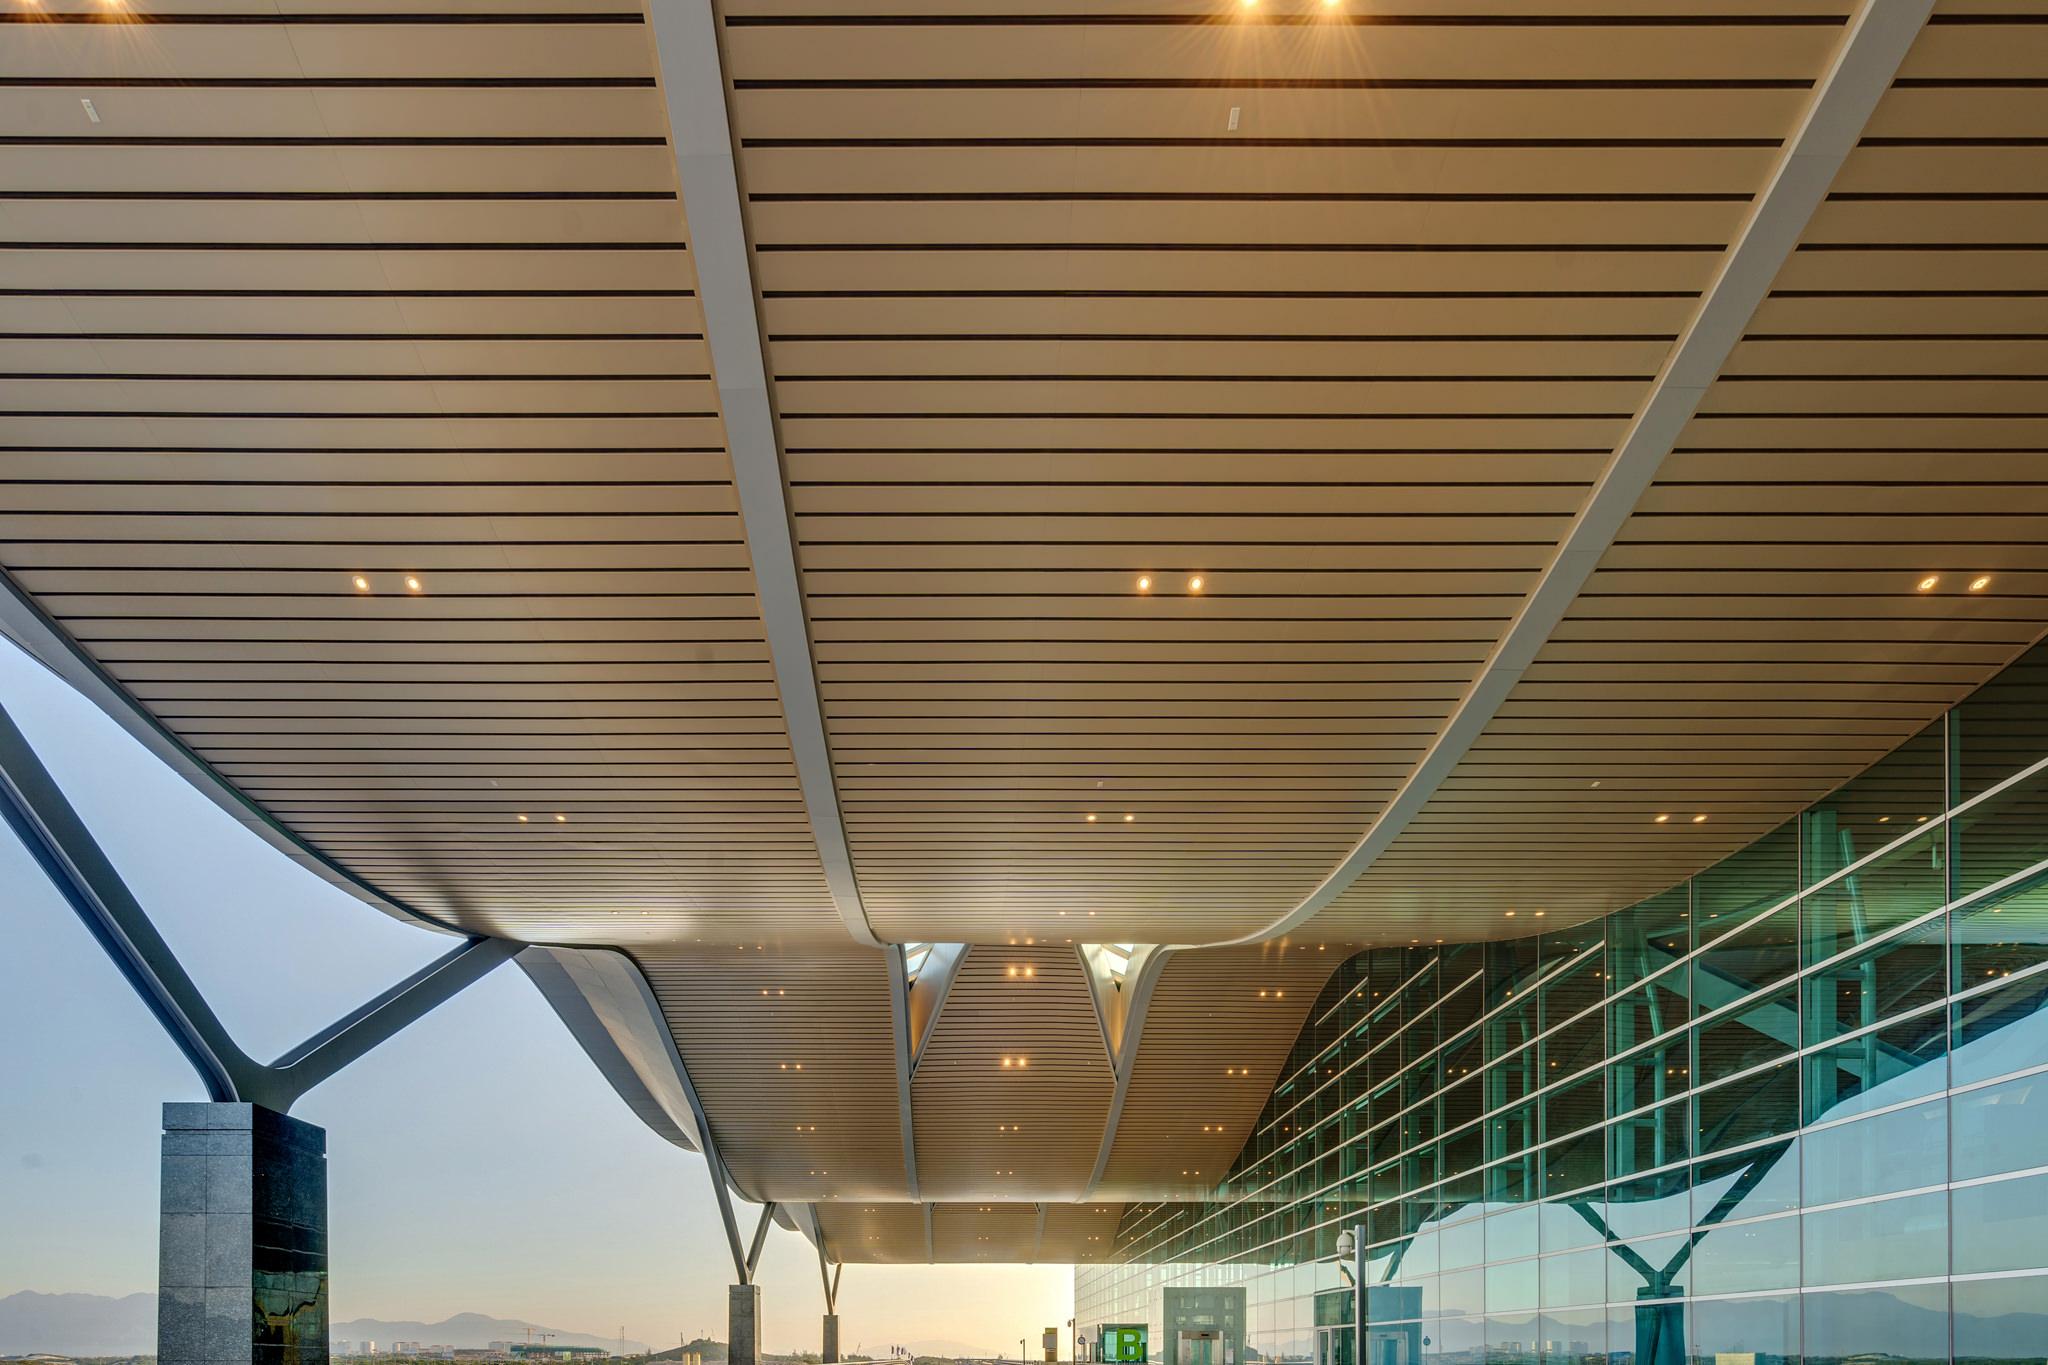 20180626 - Cam Ranh Airport - Architecture - 0063.jpg